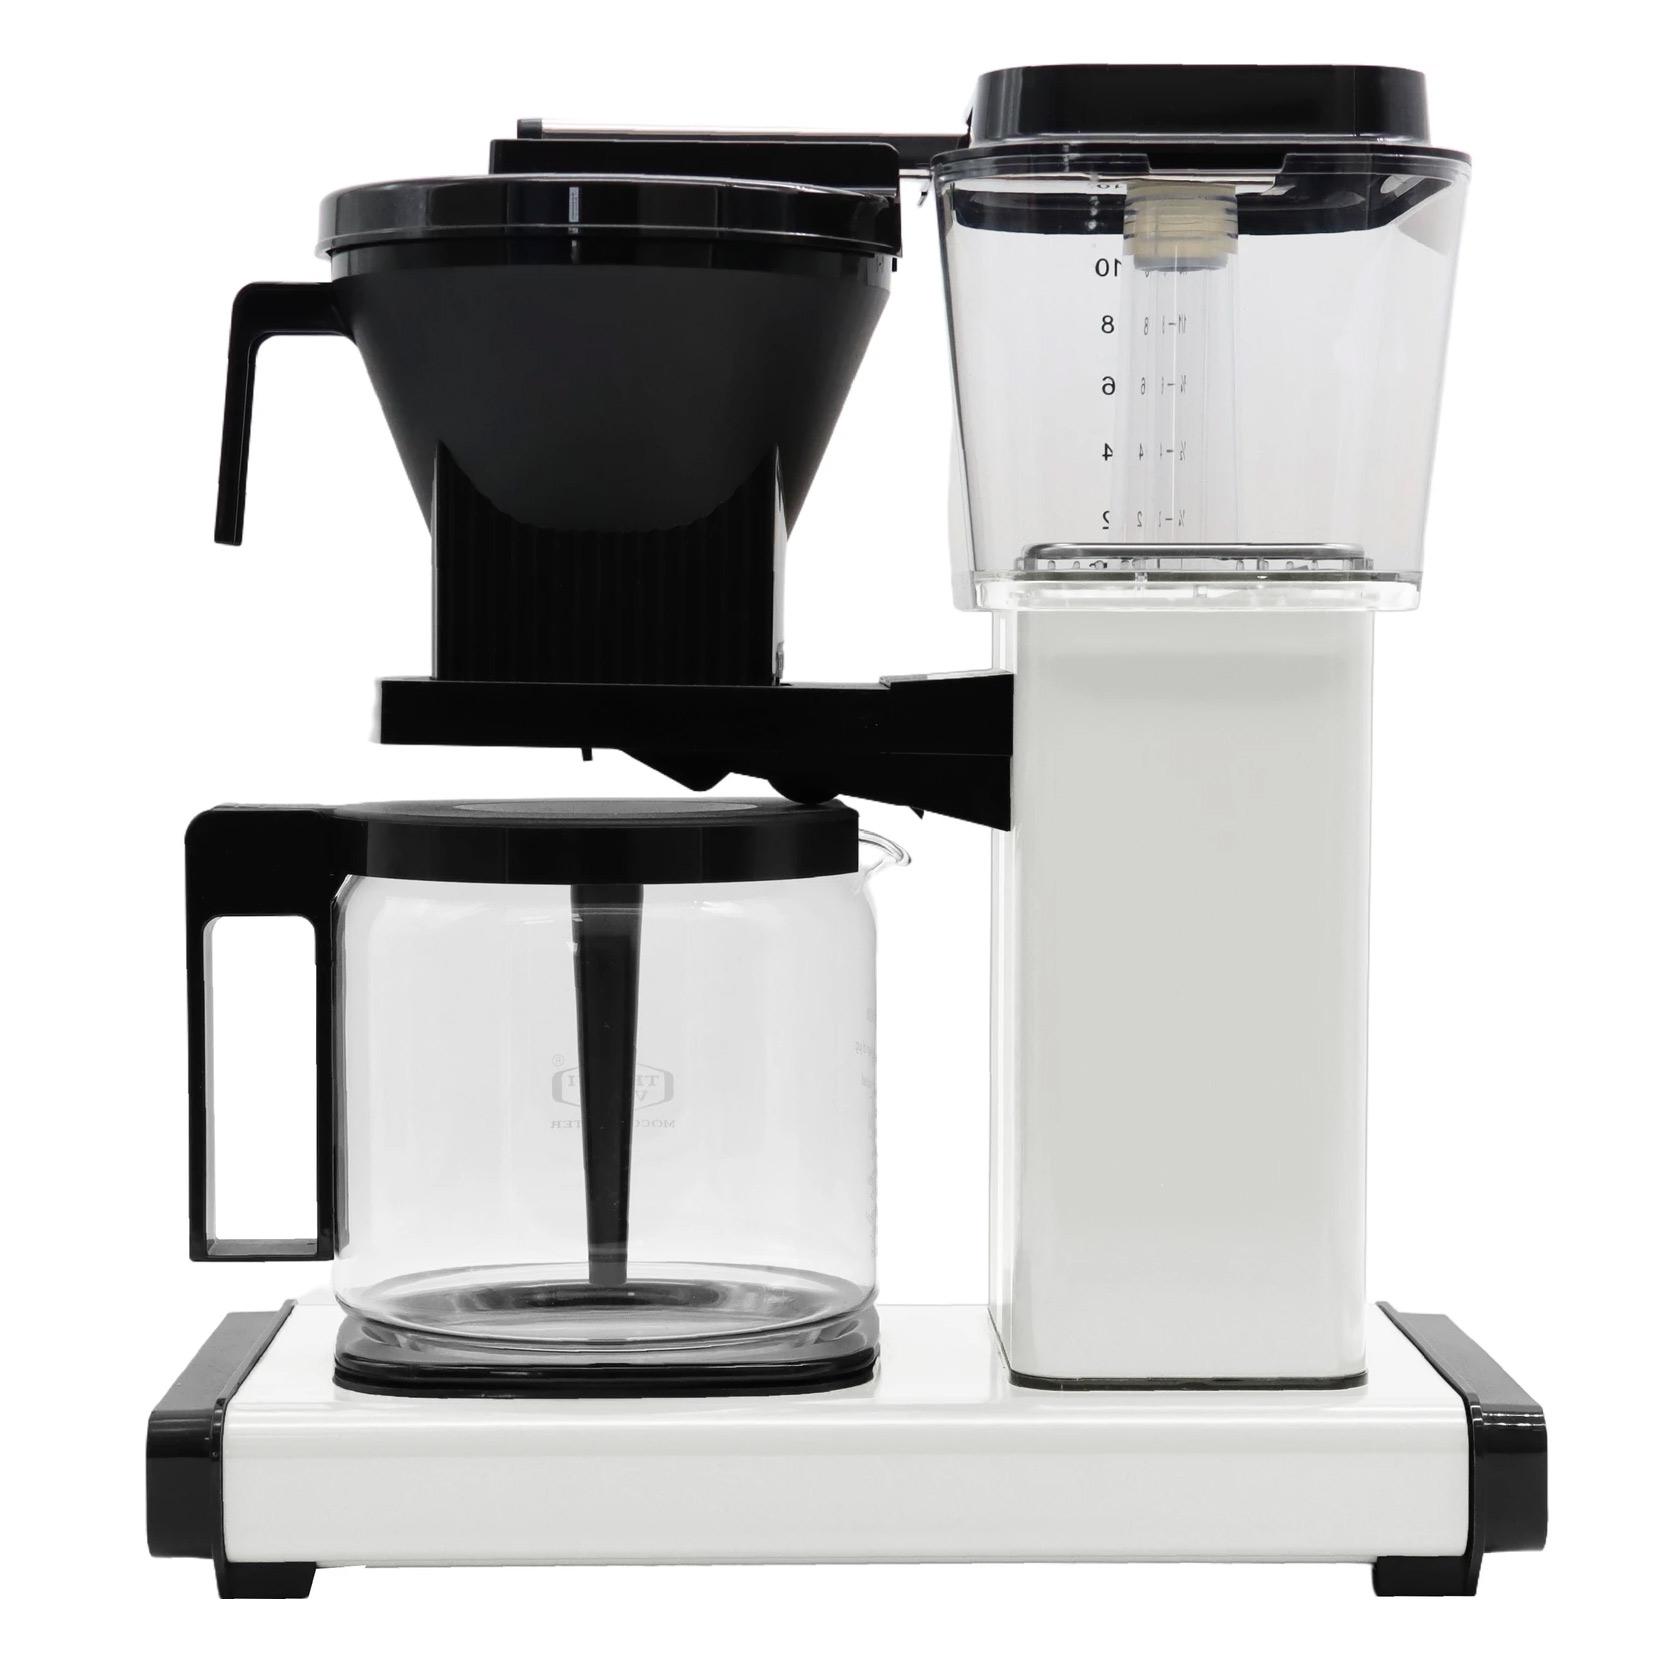 Technivorm Moccamaster KBGV Select Brewer Glass Carafe Off White - 53933